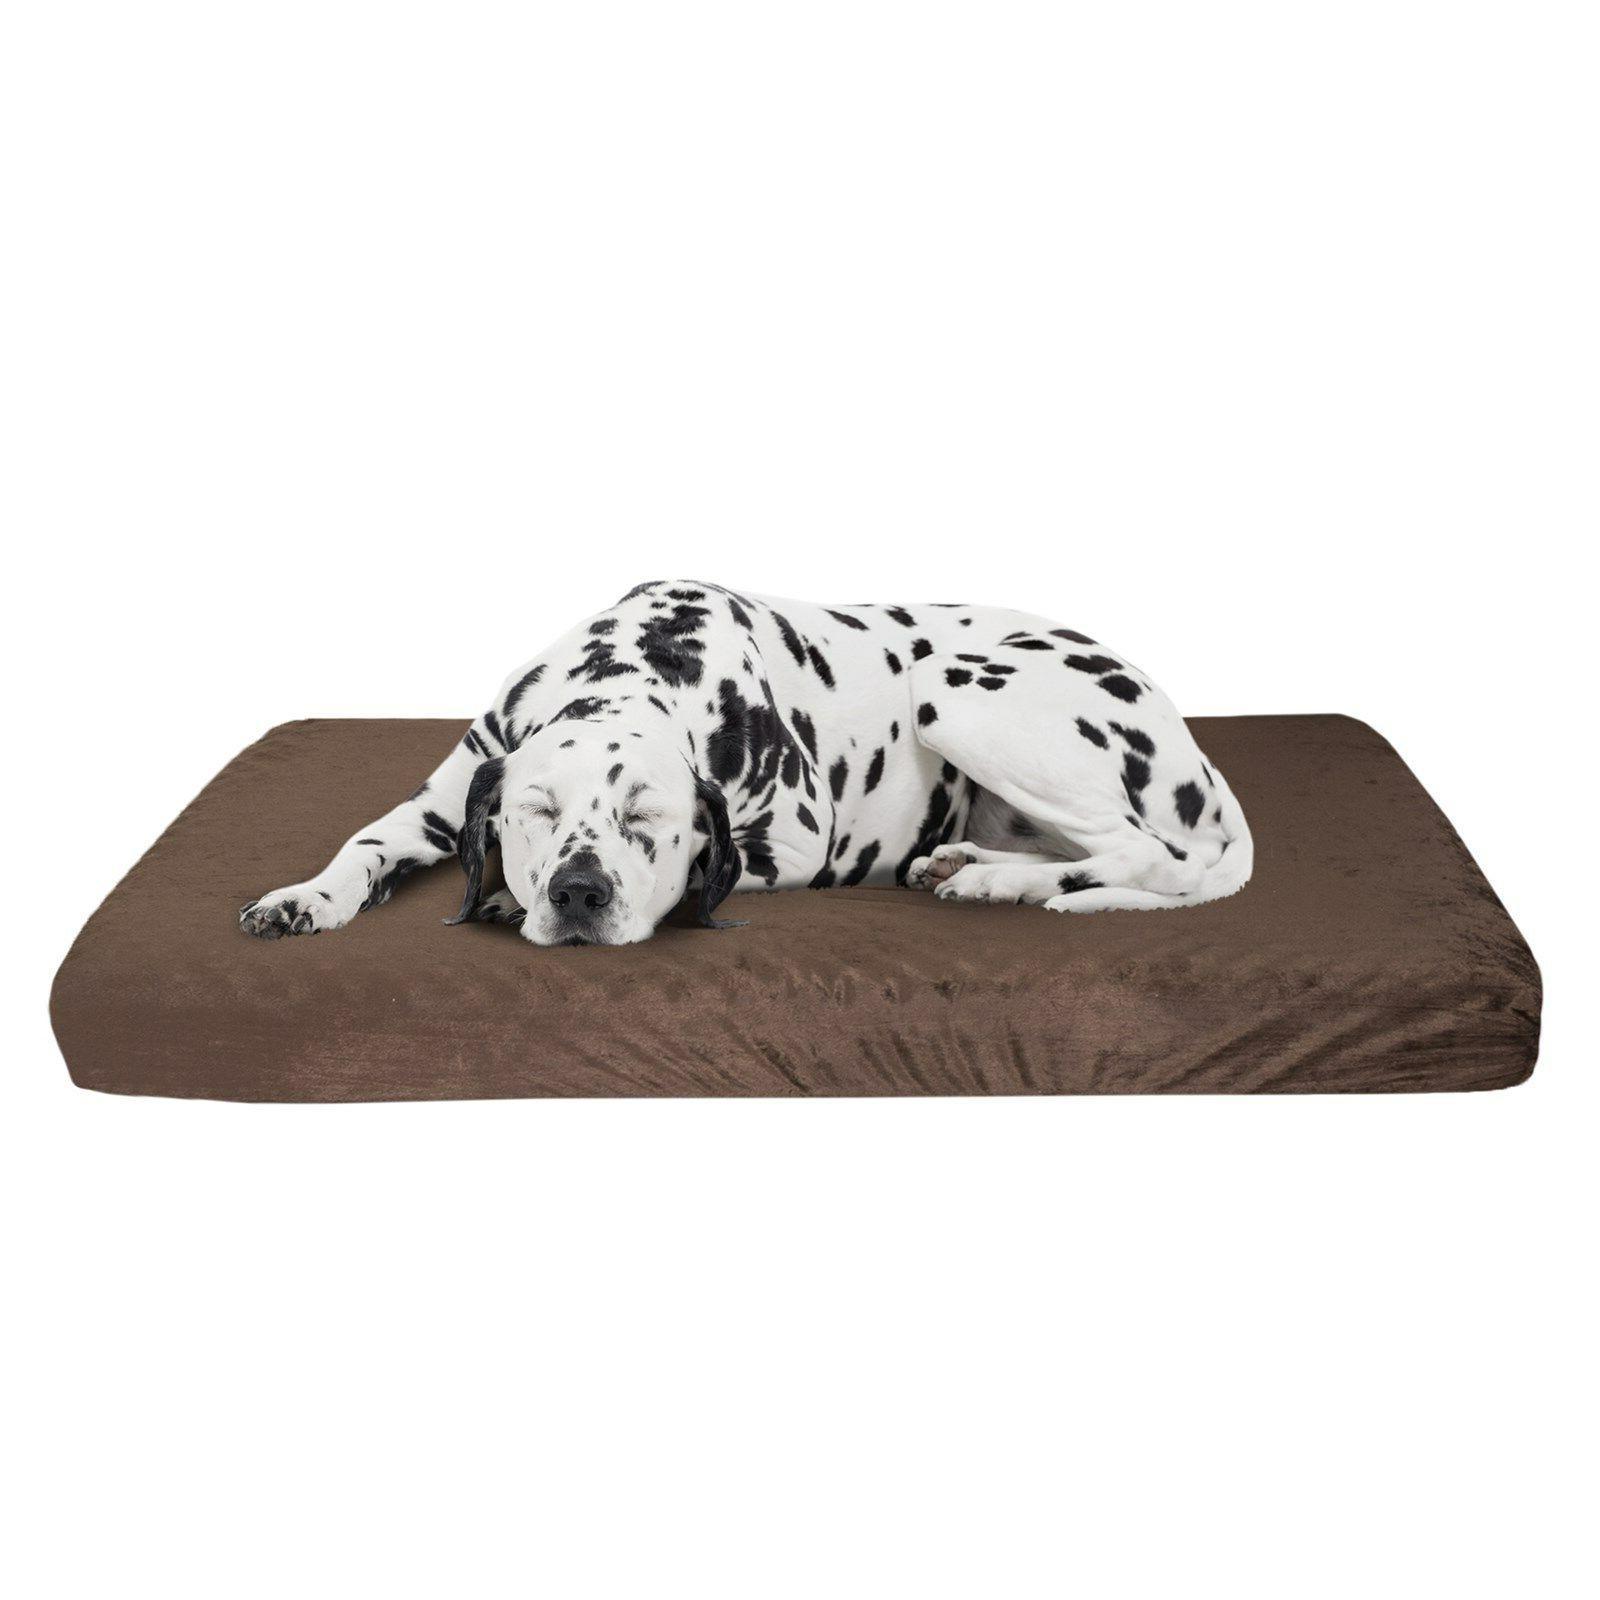 Orthopedic Dog Memory Foam and Egg 46 4 X Large XL